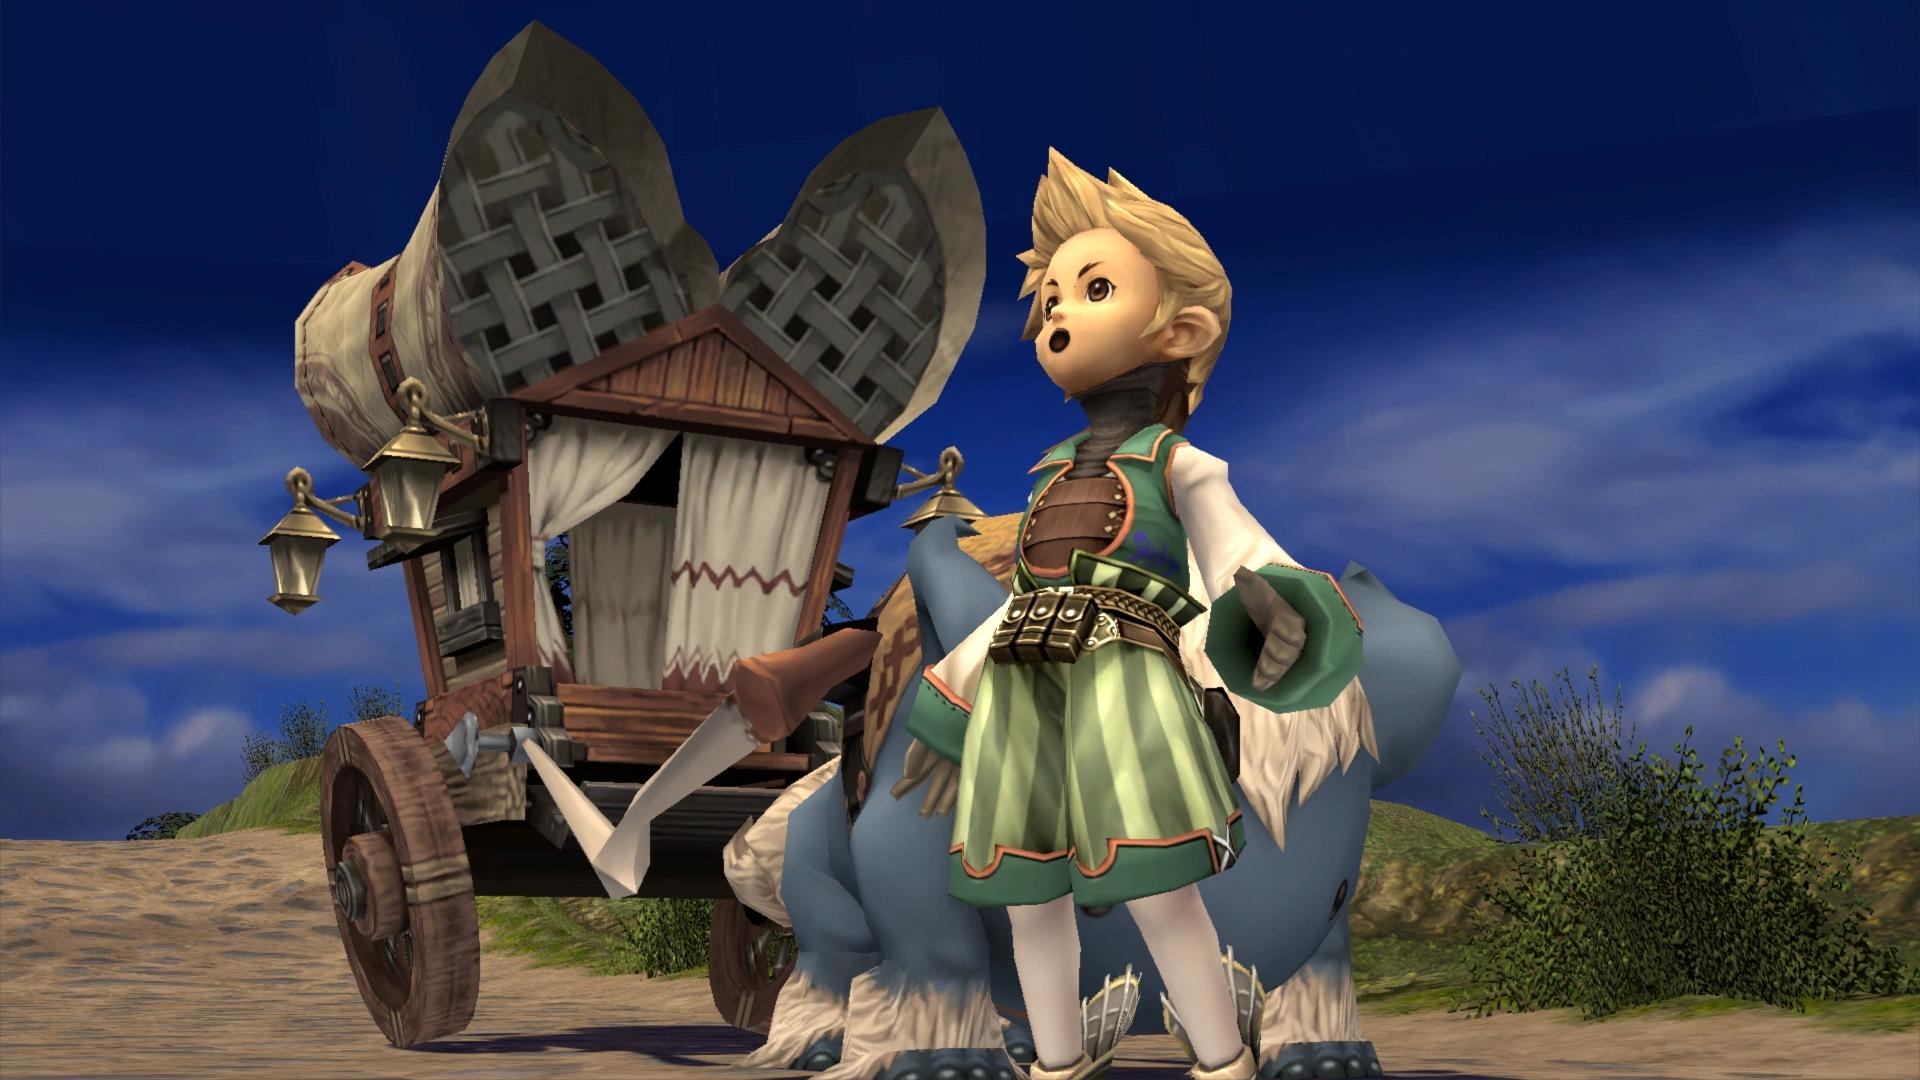 Final Fantasy Crystal Chronicles Remastered Edition выйдет на Switch 27 августа